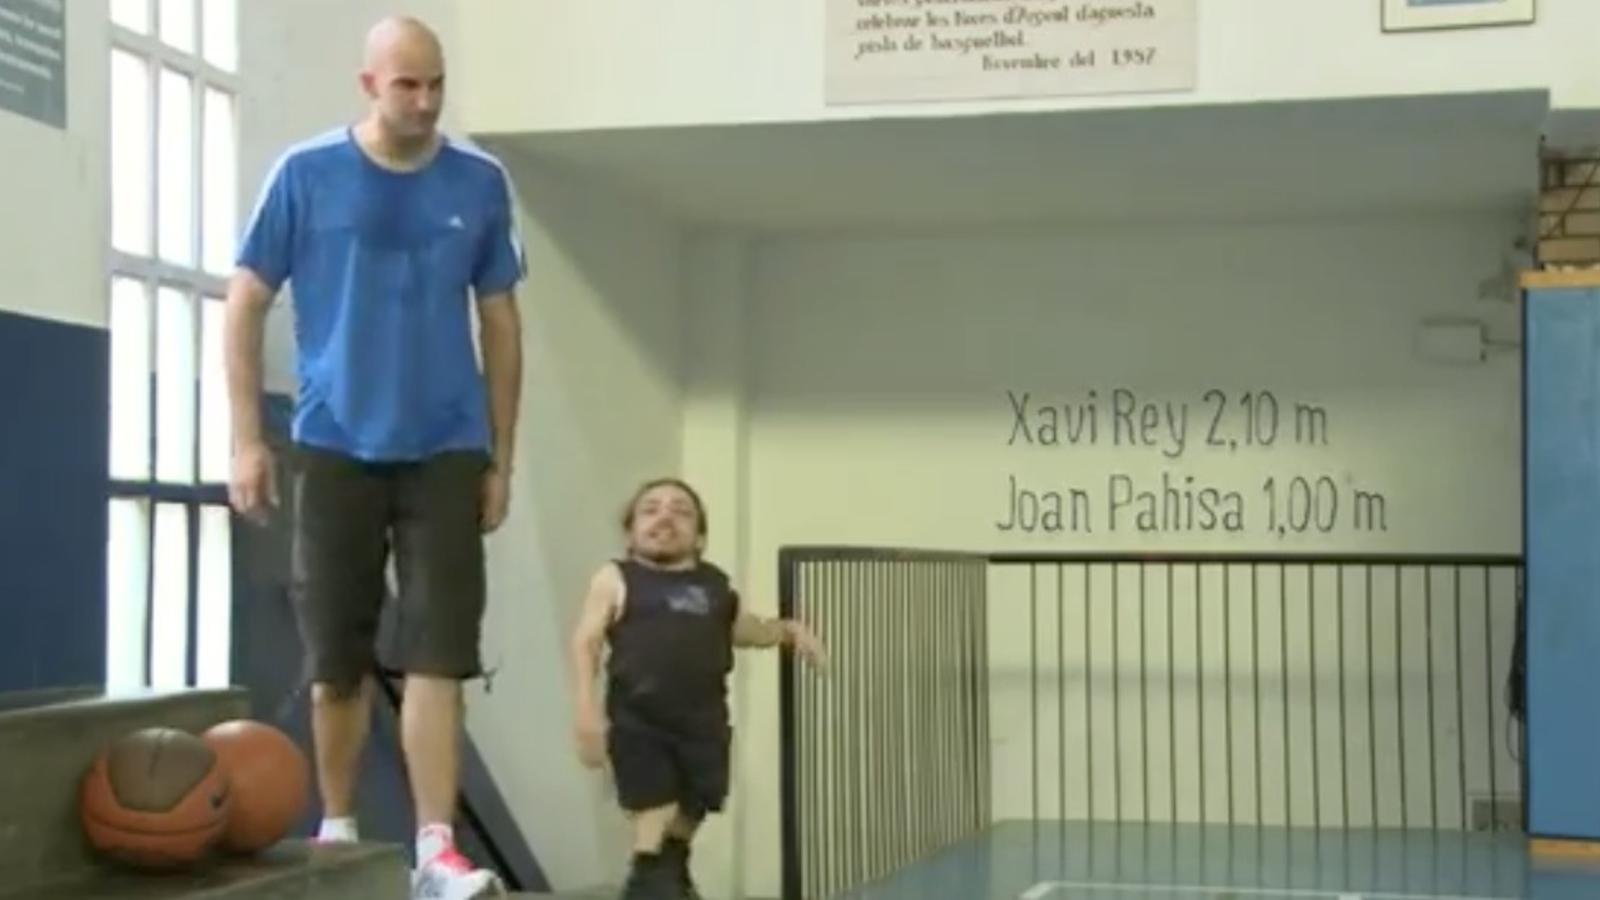 Entrenament de Joan Pahisa i Xavi Rey